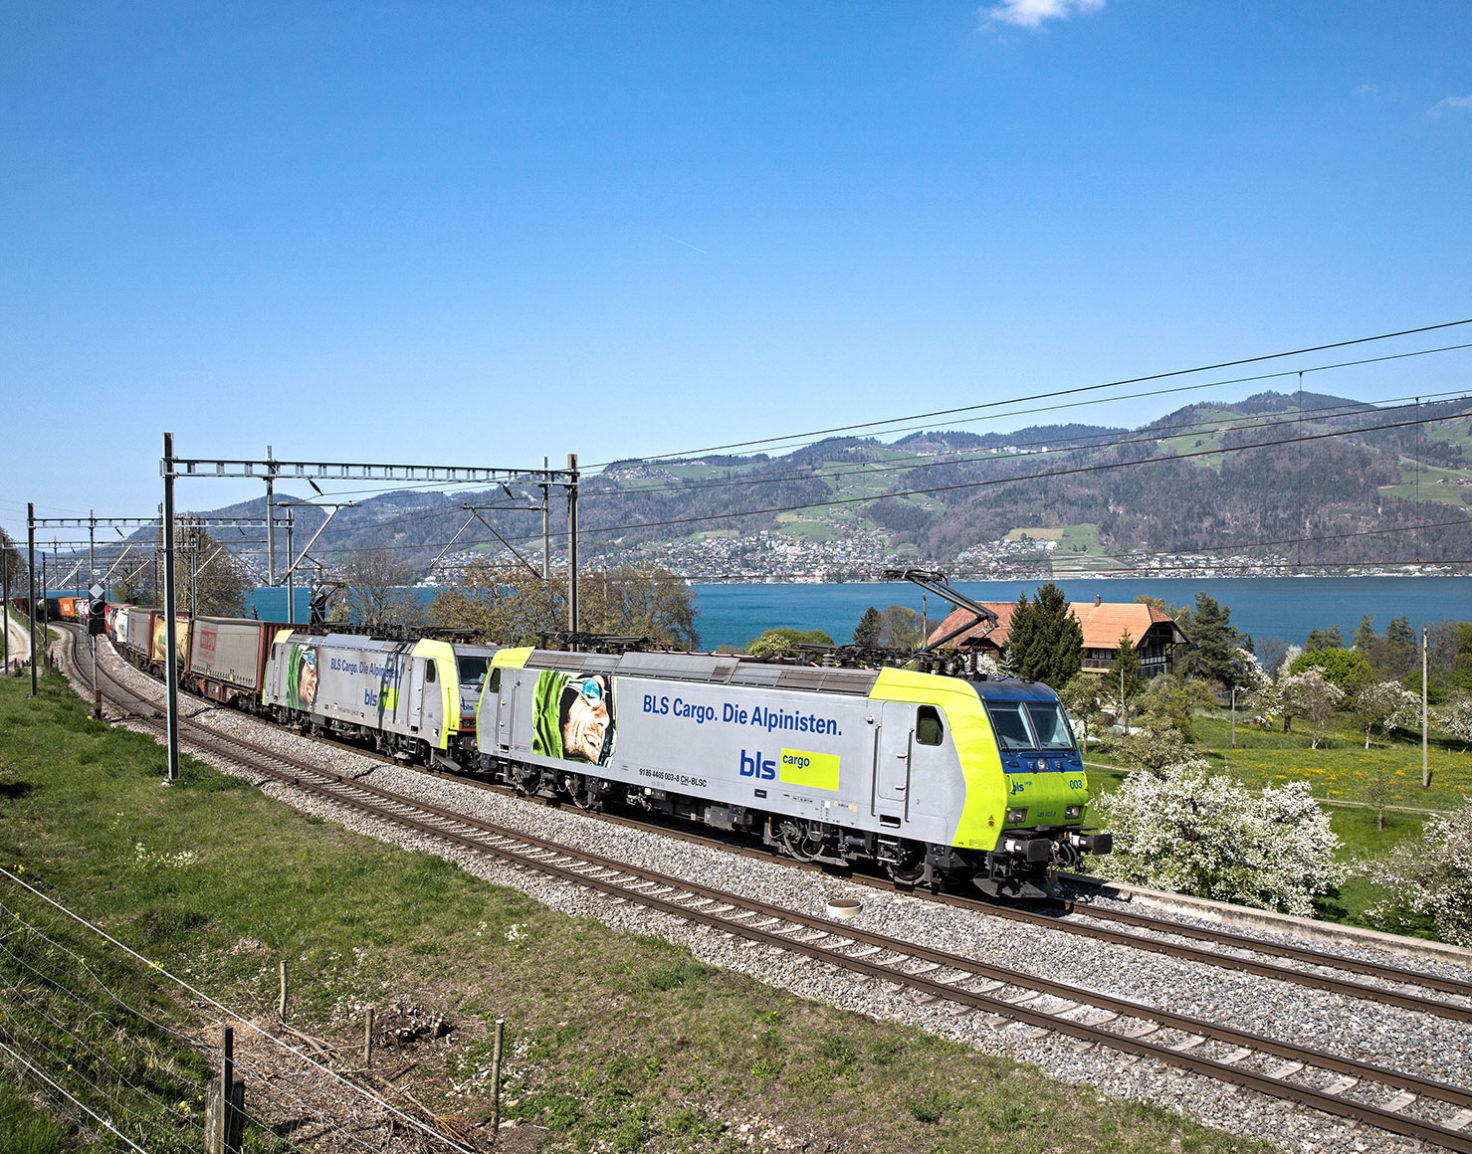 BLS_Cargo_SNCF_Logistics_1480x1160